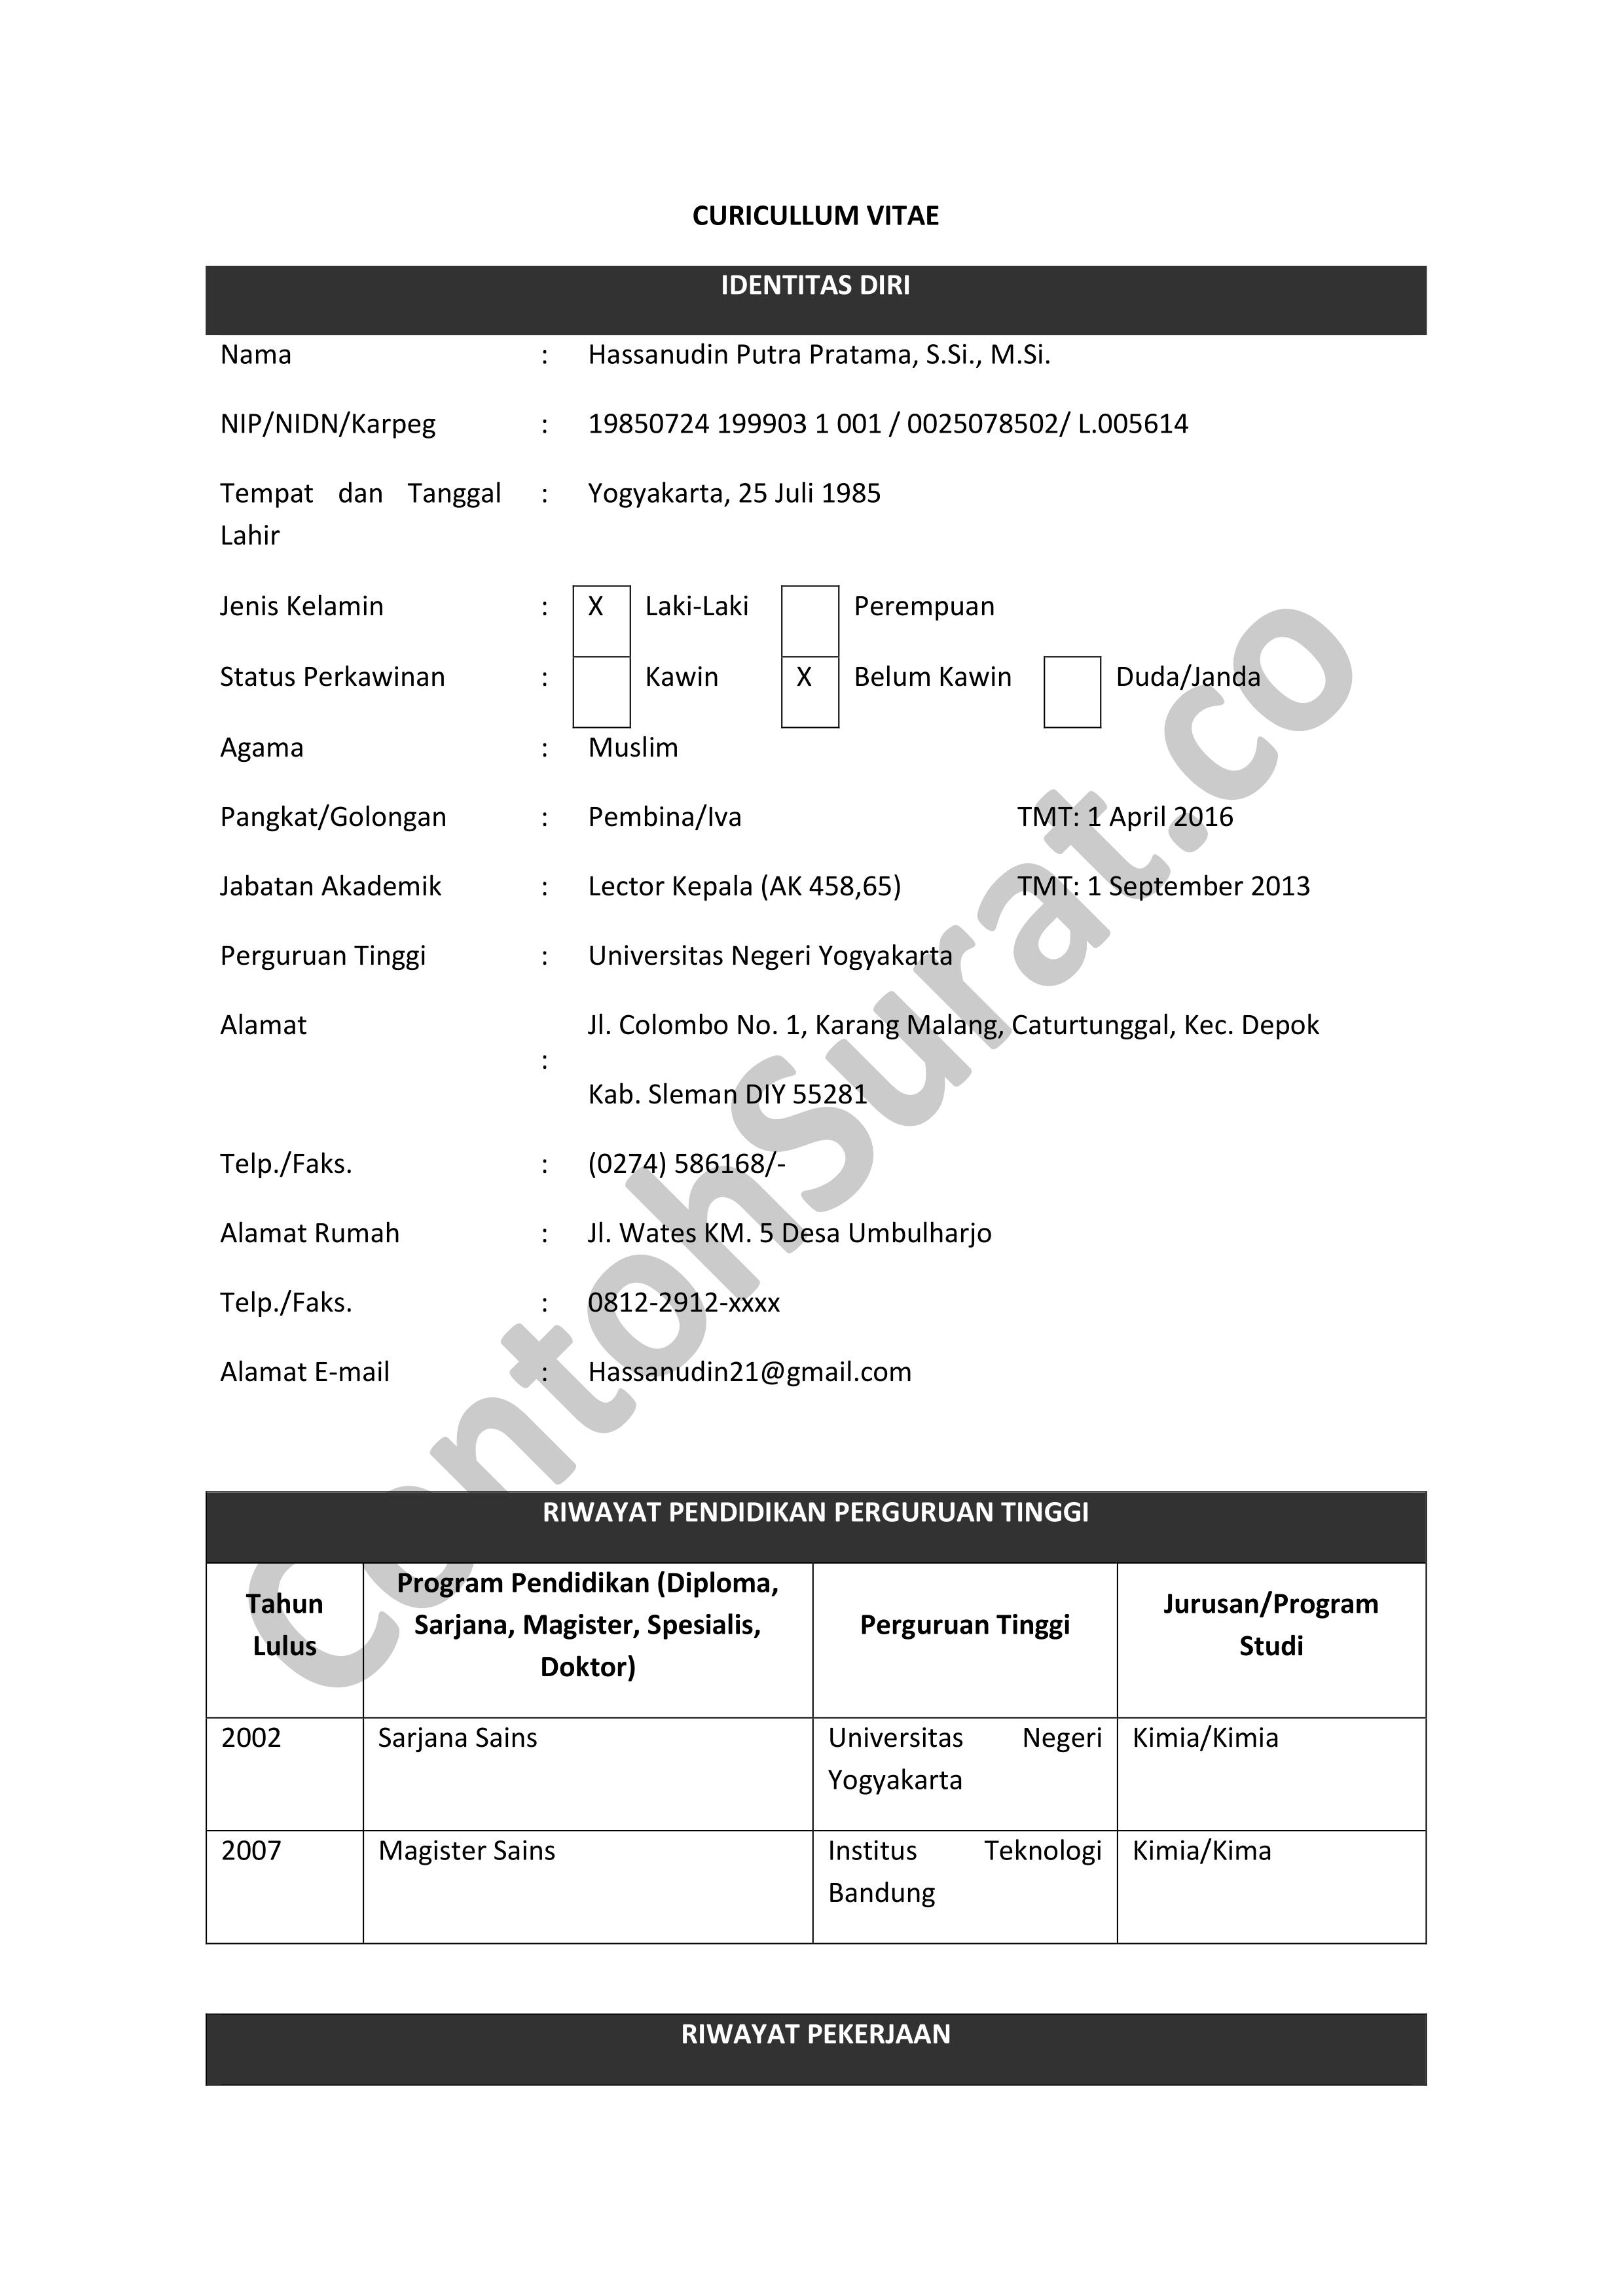 Contoh Daftar Riwayat Hidup Pegawai Negeri Sipil